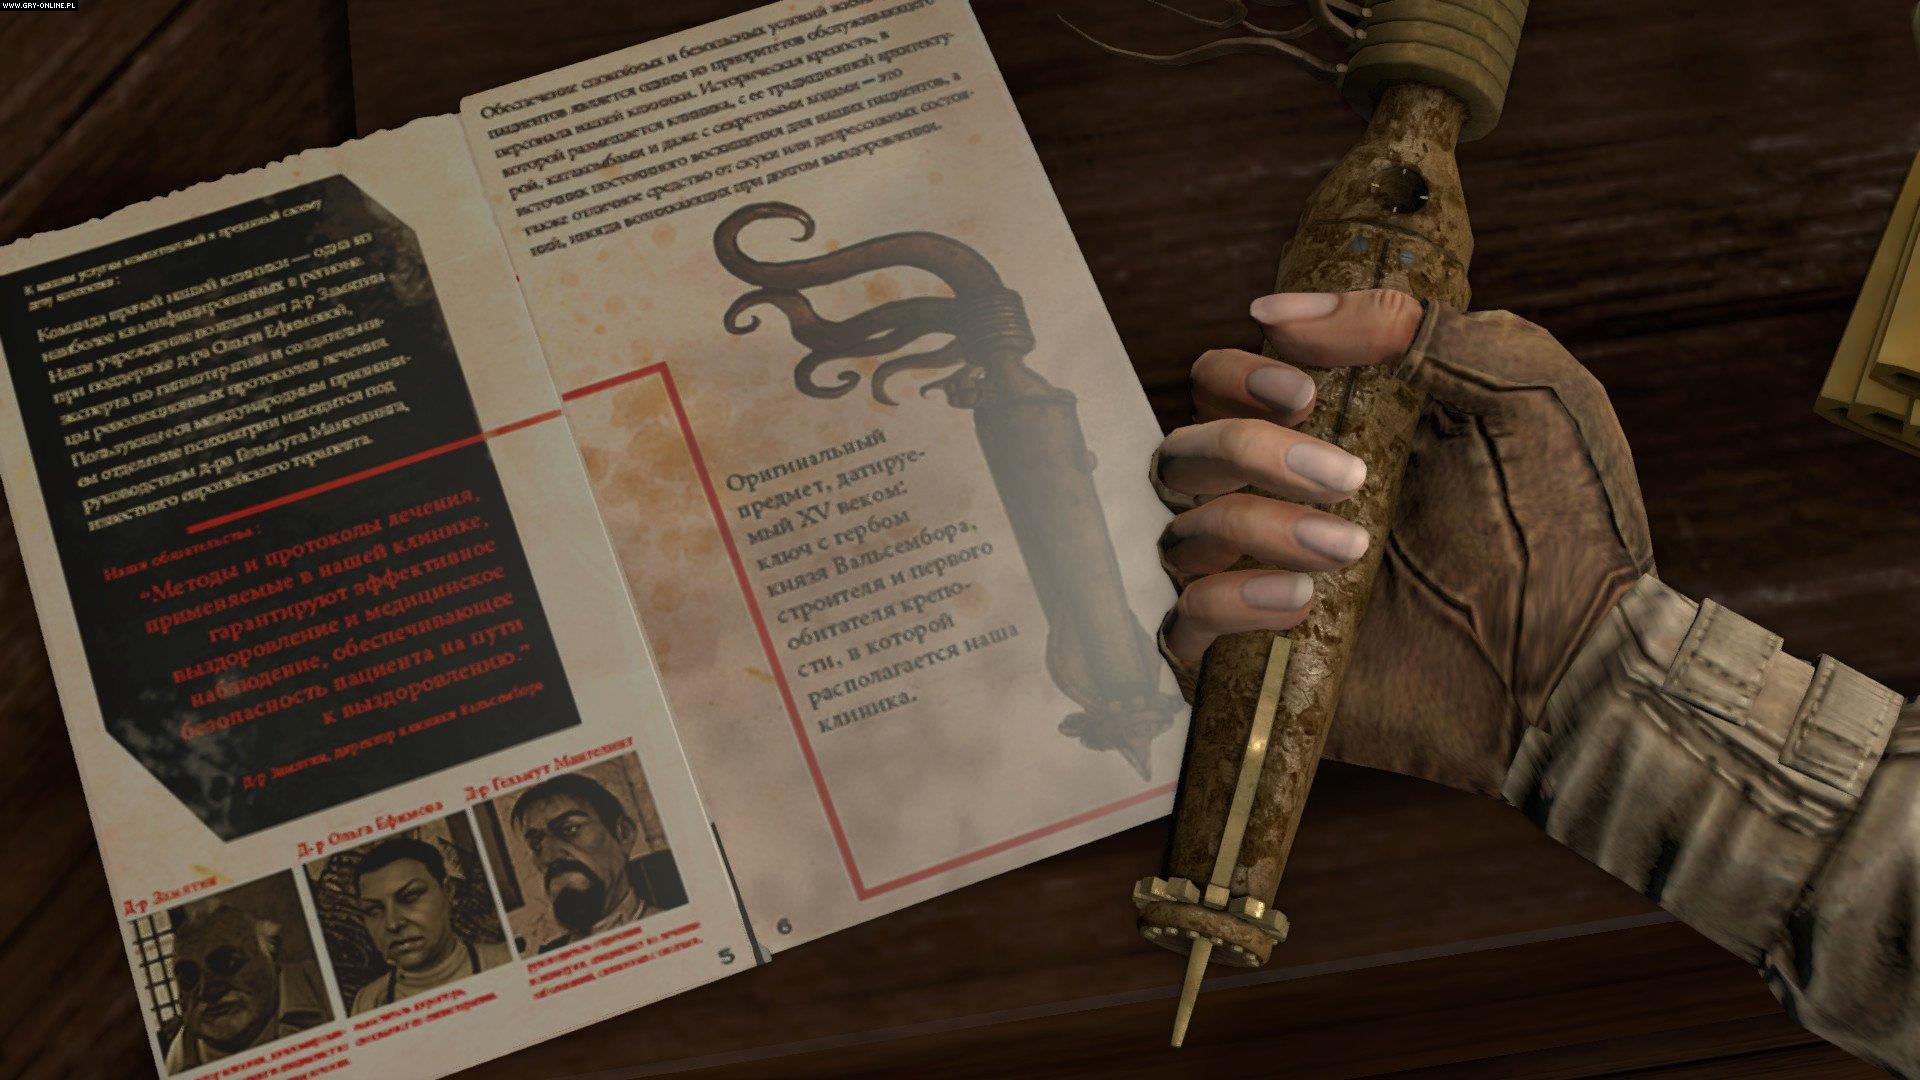 Syberia 3 PC, PS4, XONE Games Image 5/30, Microids/Anuman Interactive